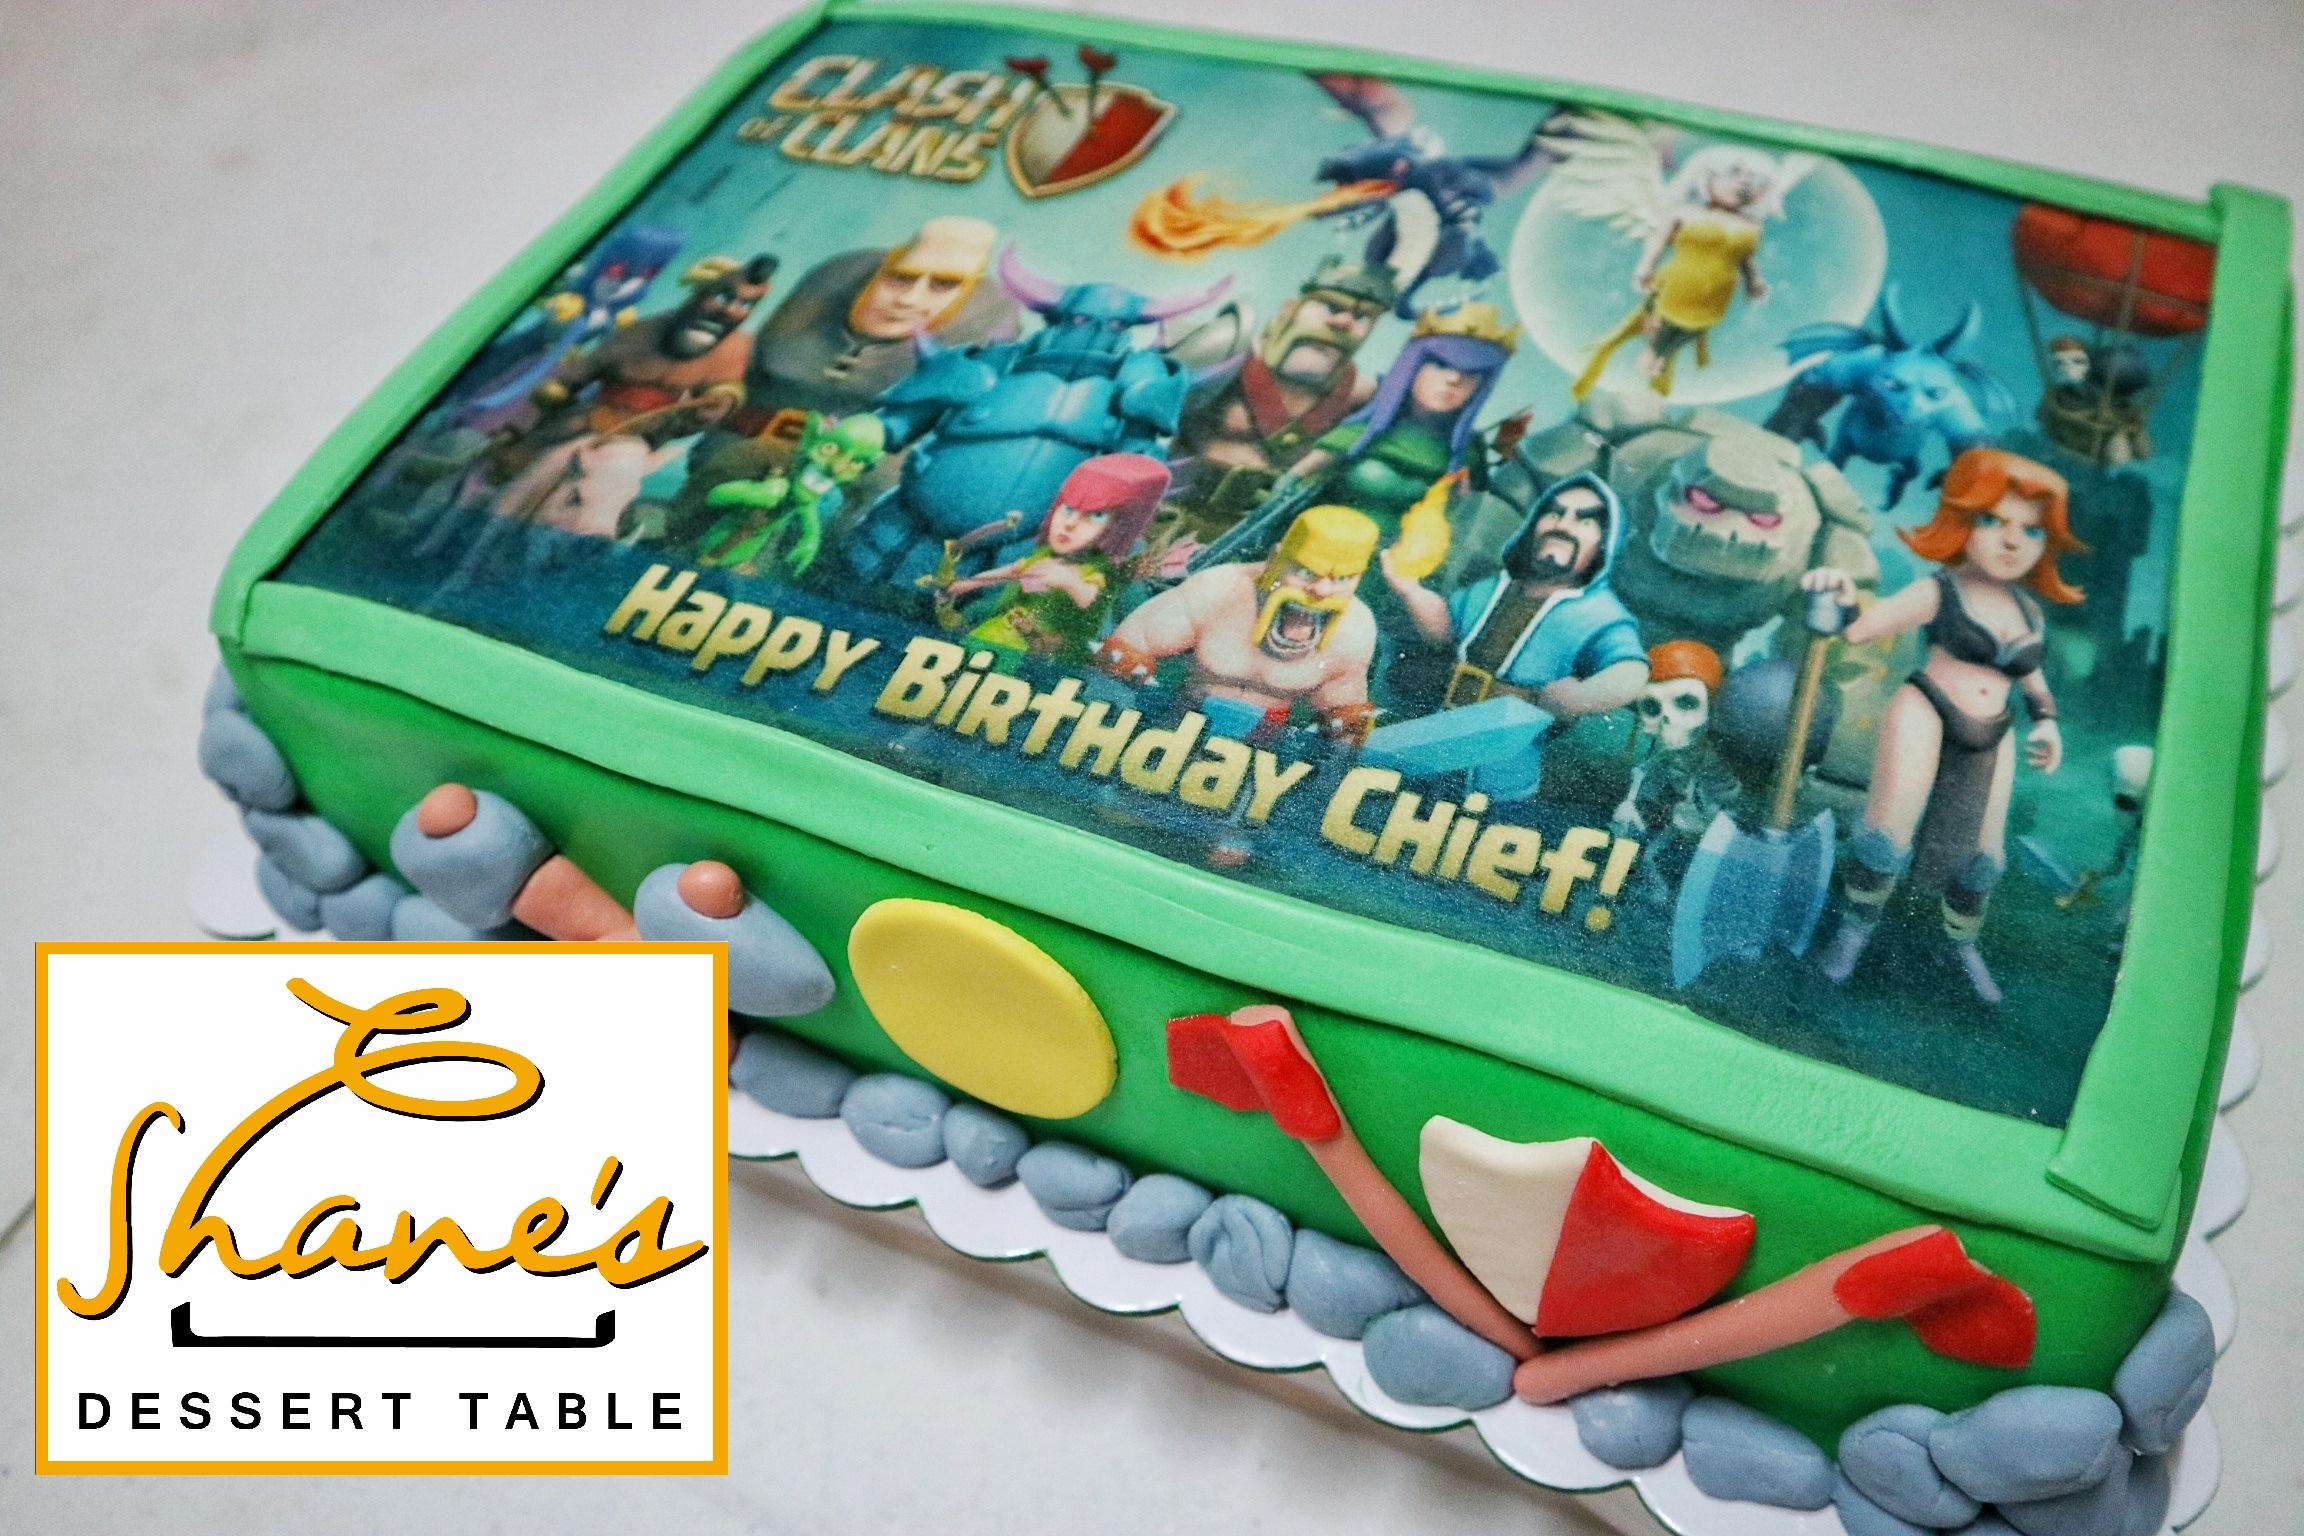 Clash Of Clans Cake Shane S Dessert Table